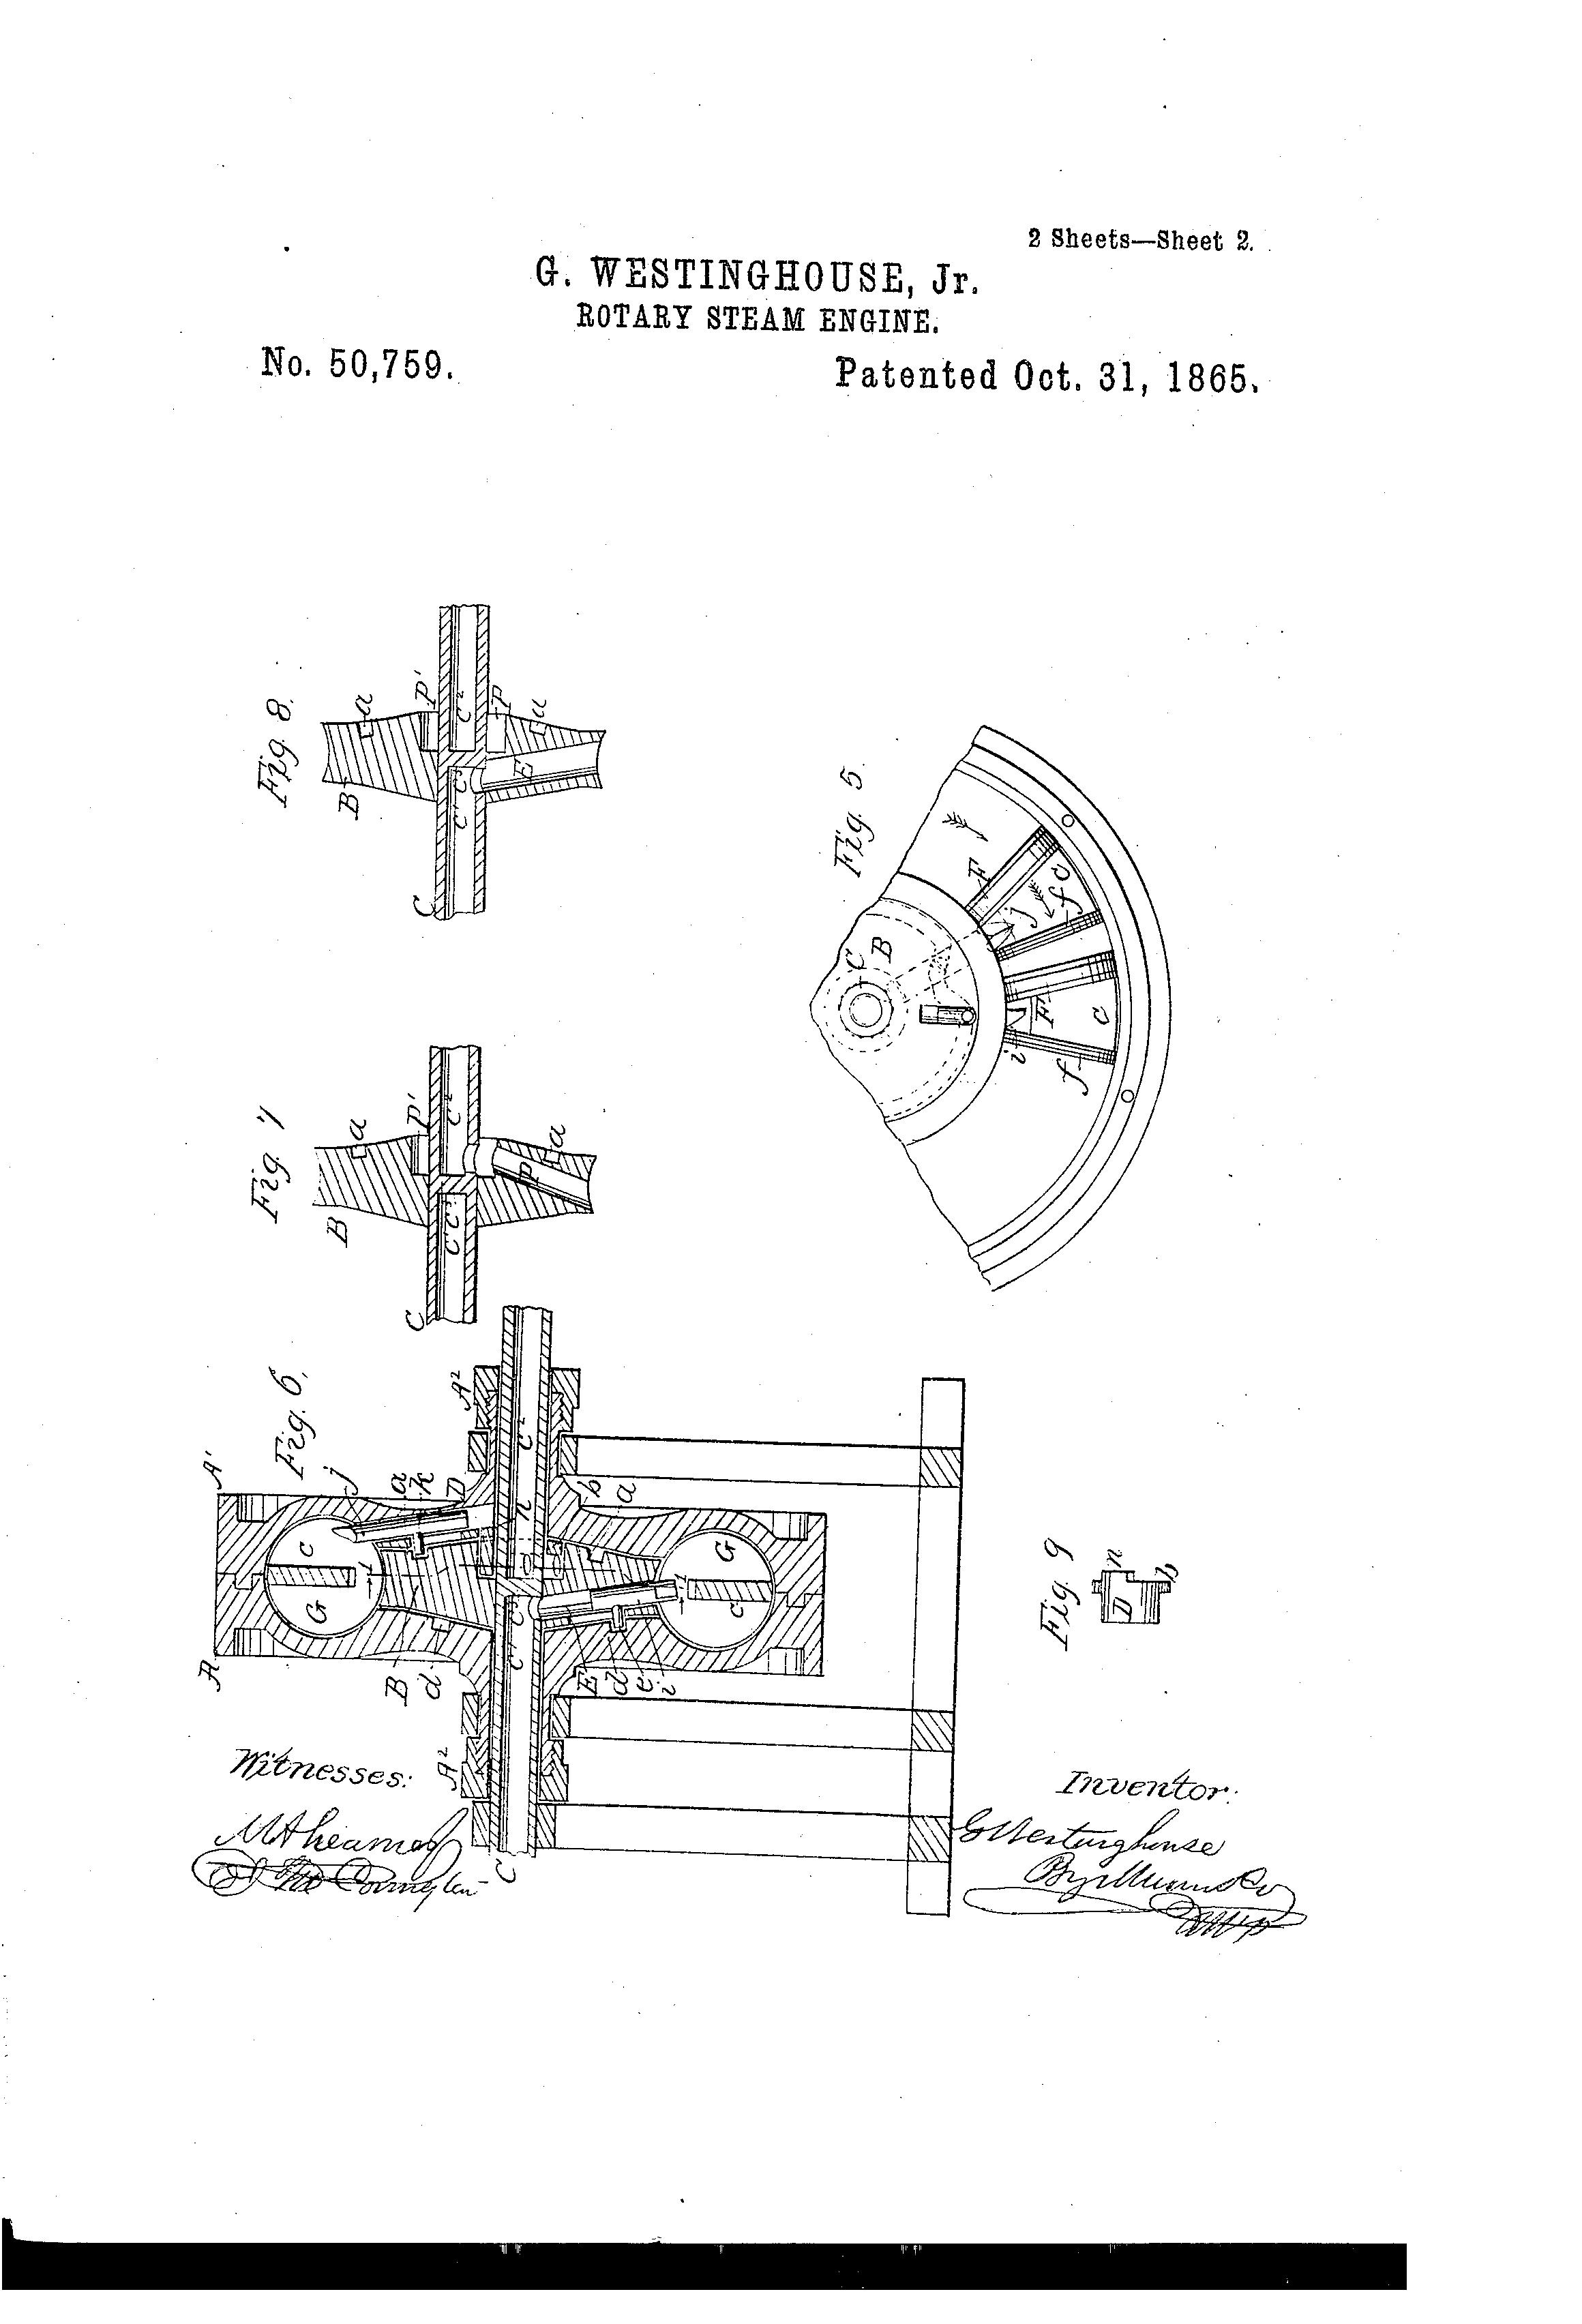 https://patentimages.storage.googleapis.com/pages/US50759